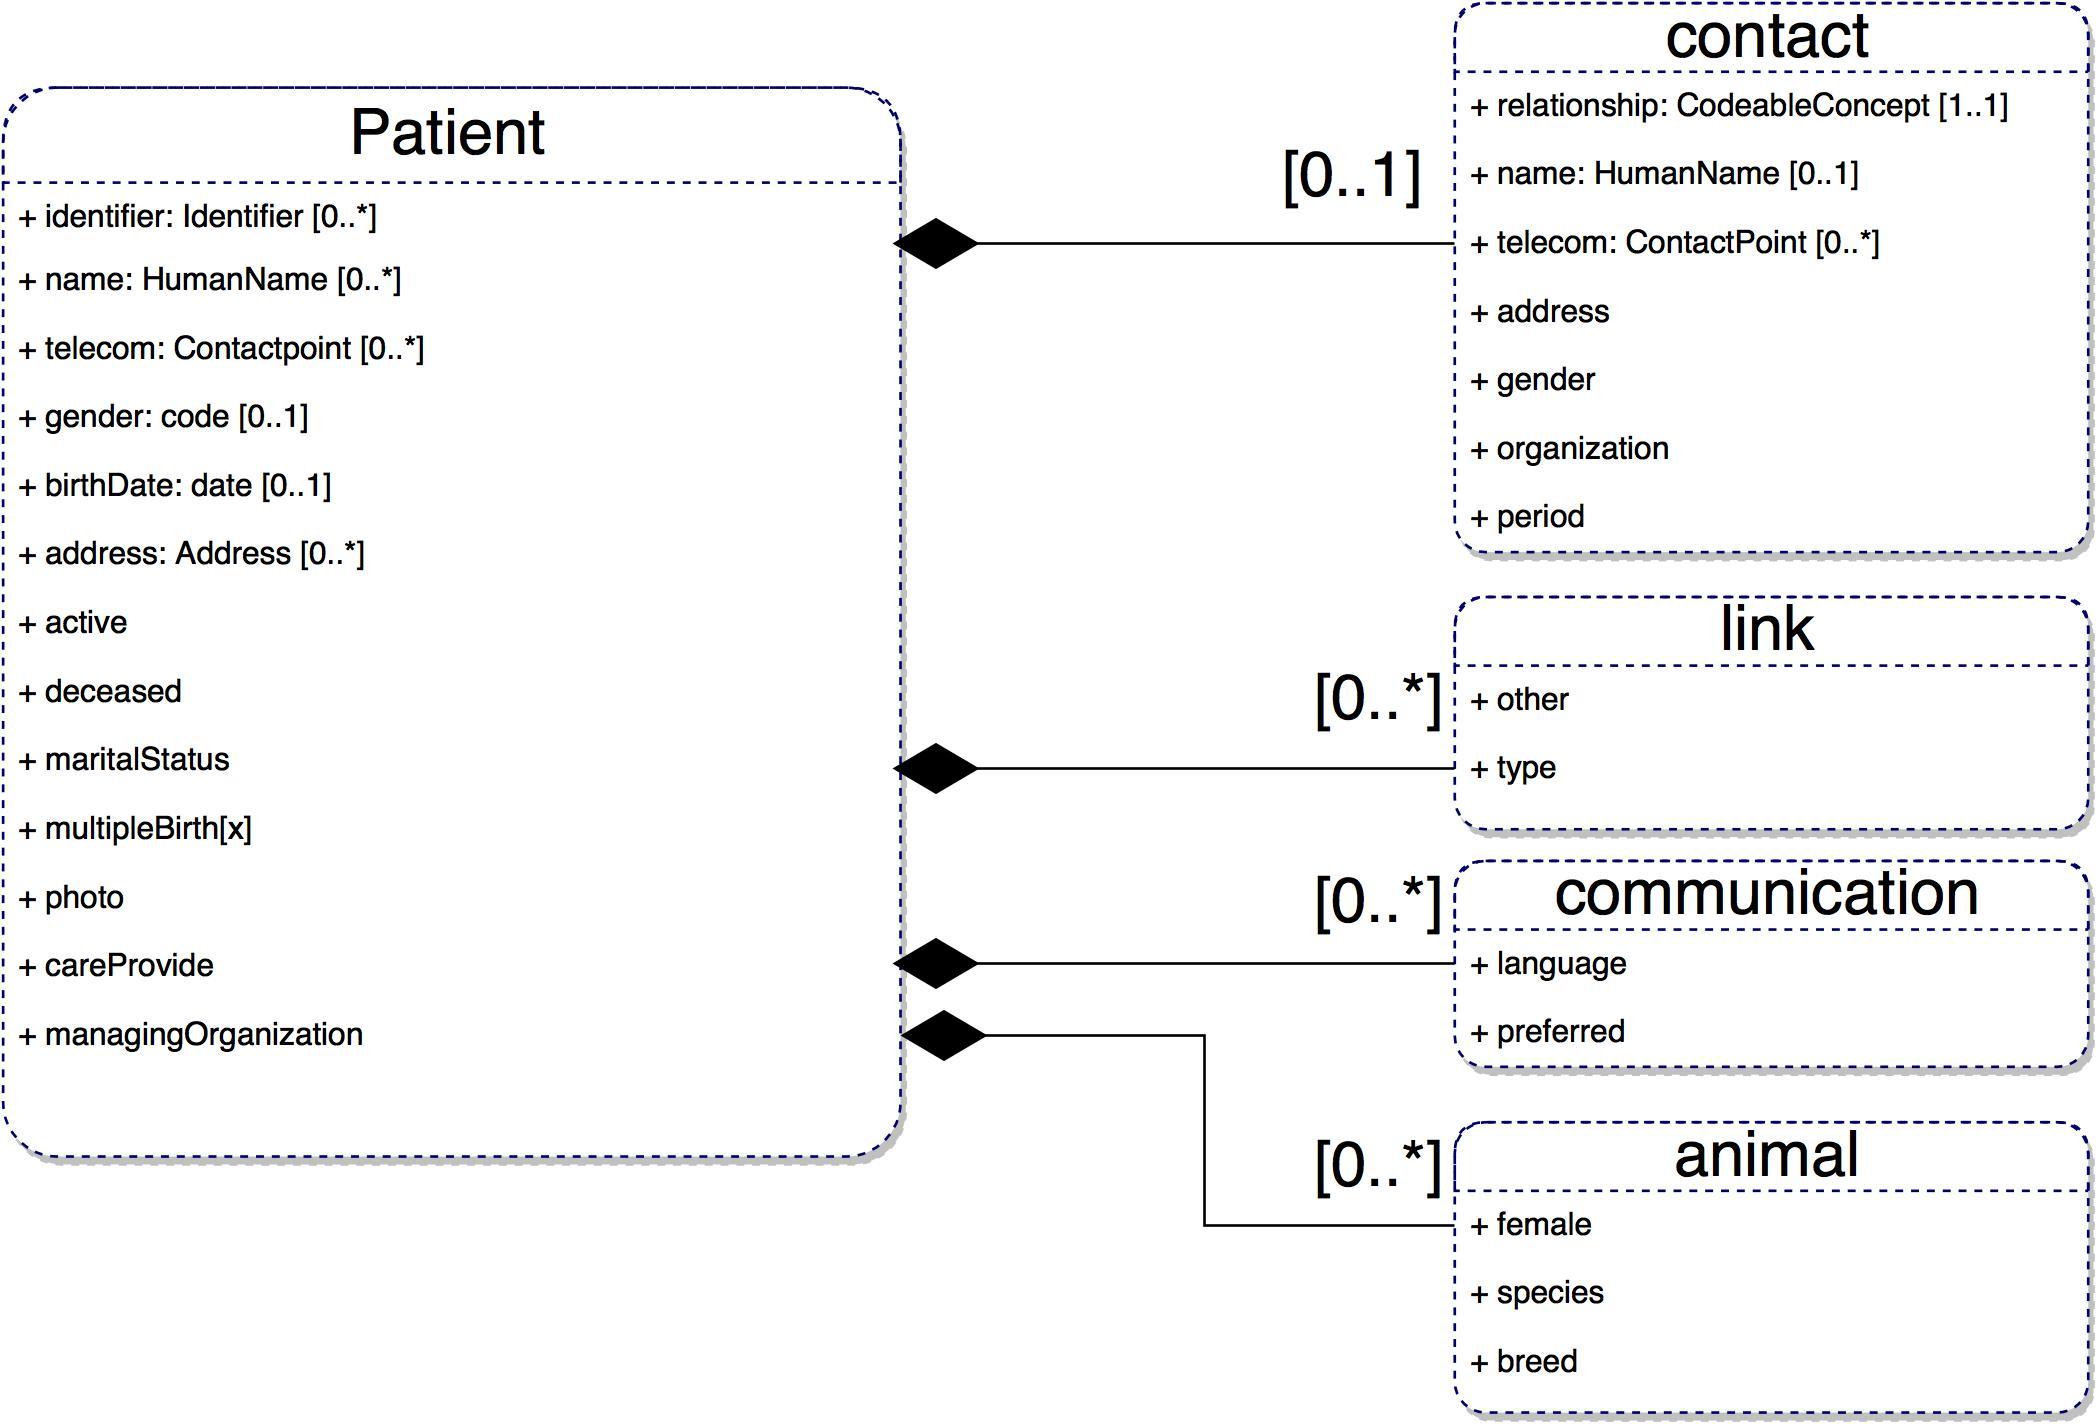 FHIR4TIHM Data Model